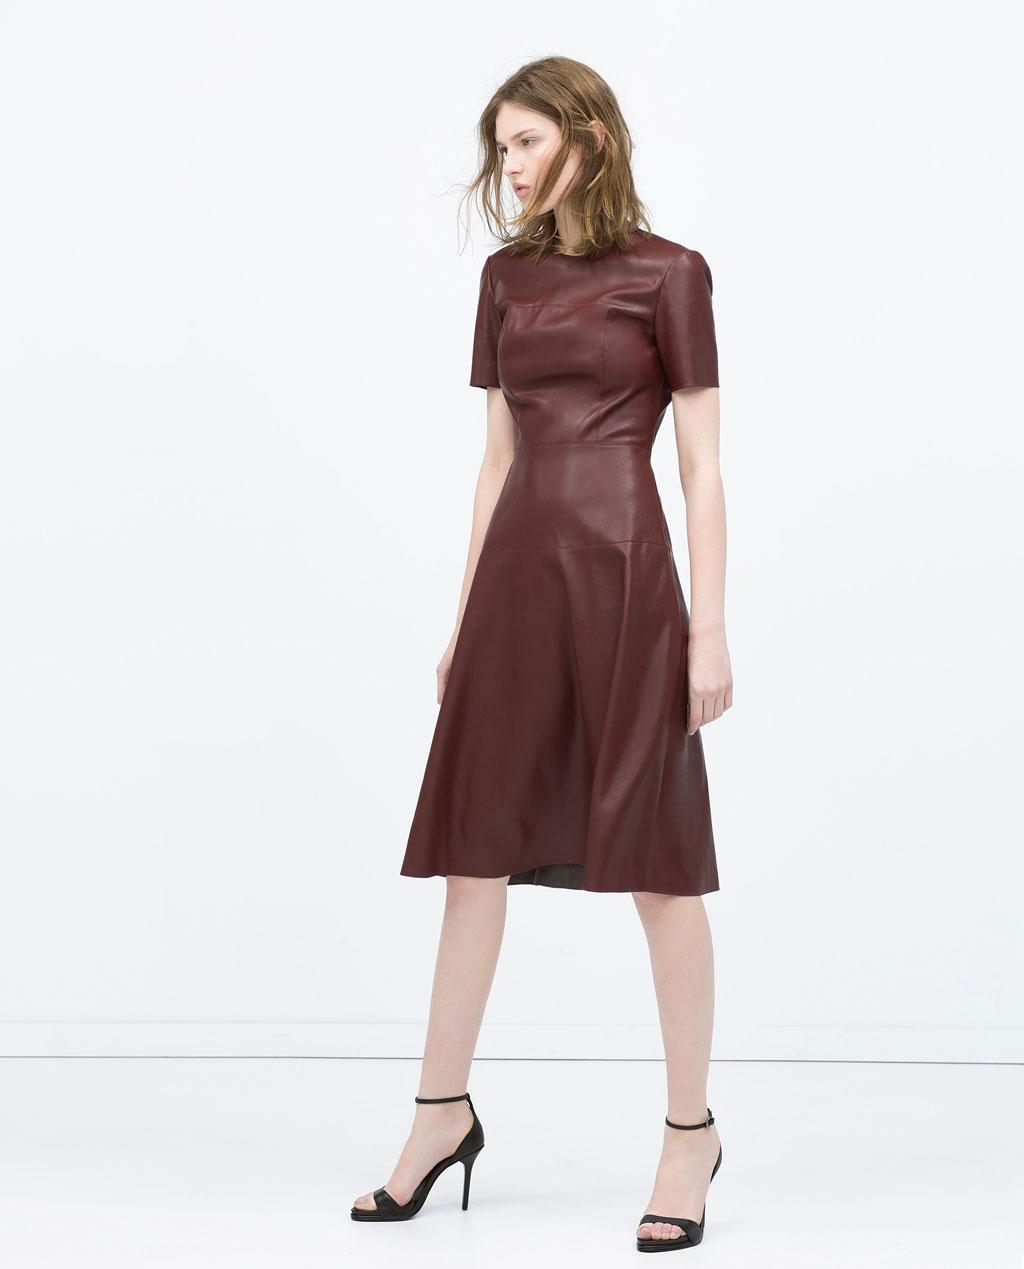 chic stylish on a budget 10 beautiful dresses under 50 quintessence parisienne. Black Bedroom Furniture Sets. Home Design Ideas